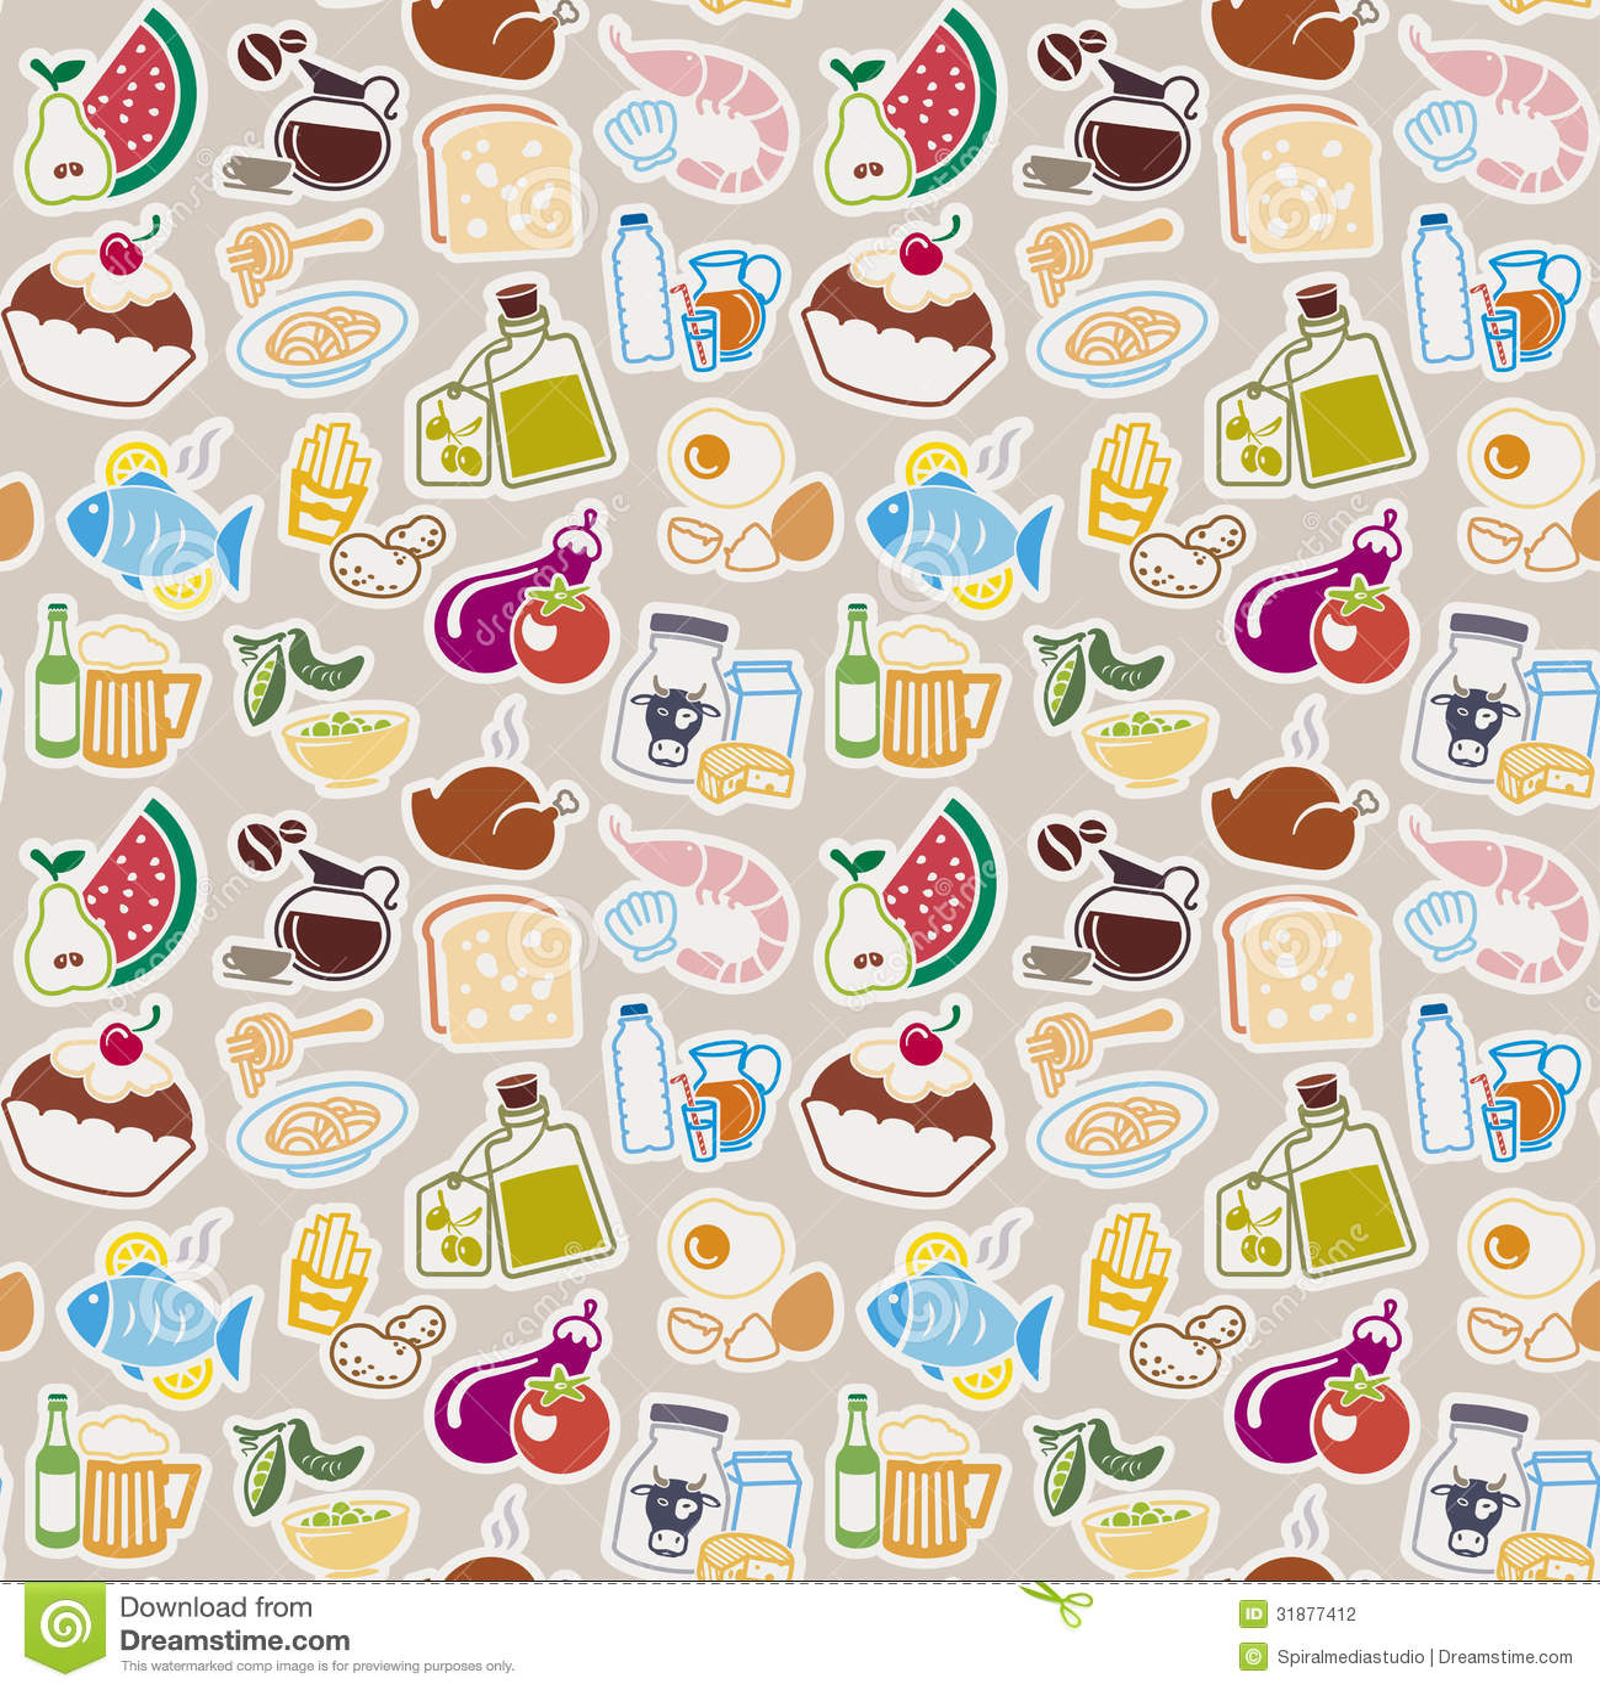 Food Pattern Photography | www.pixshark.com - Images ...